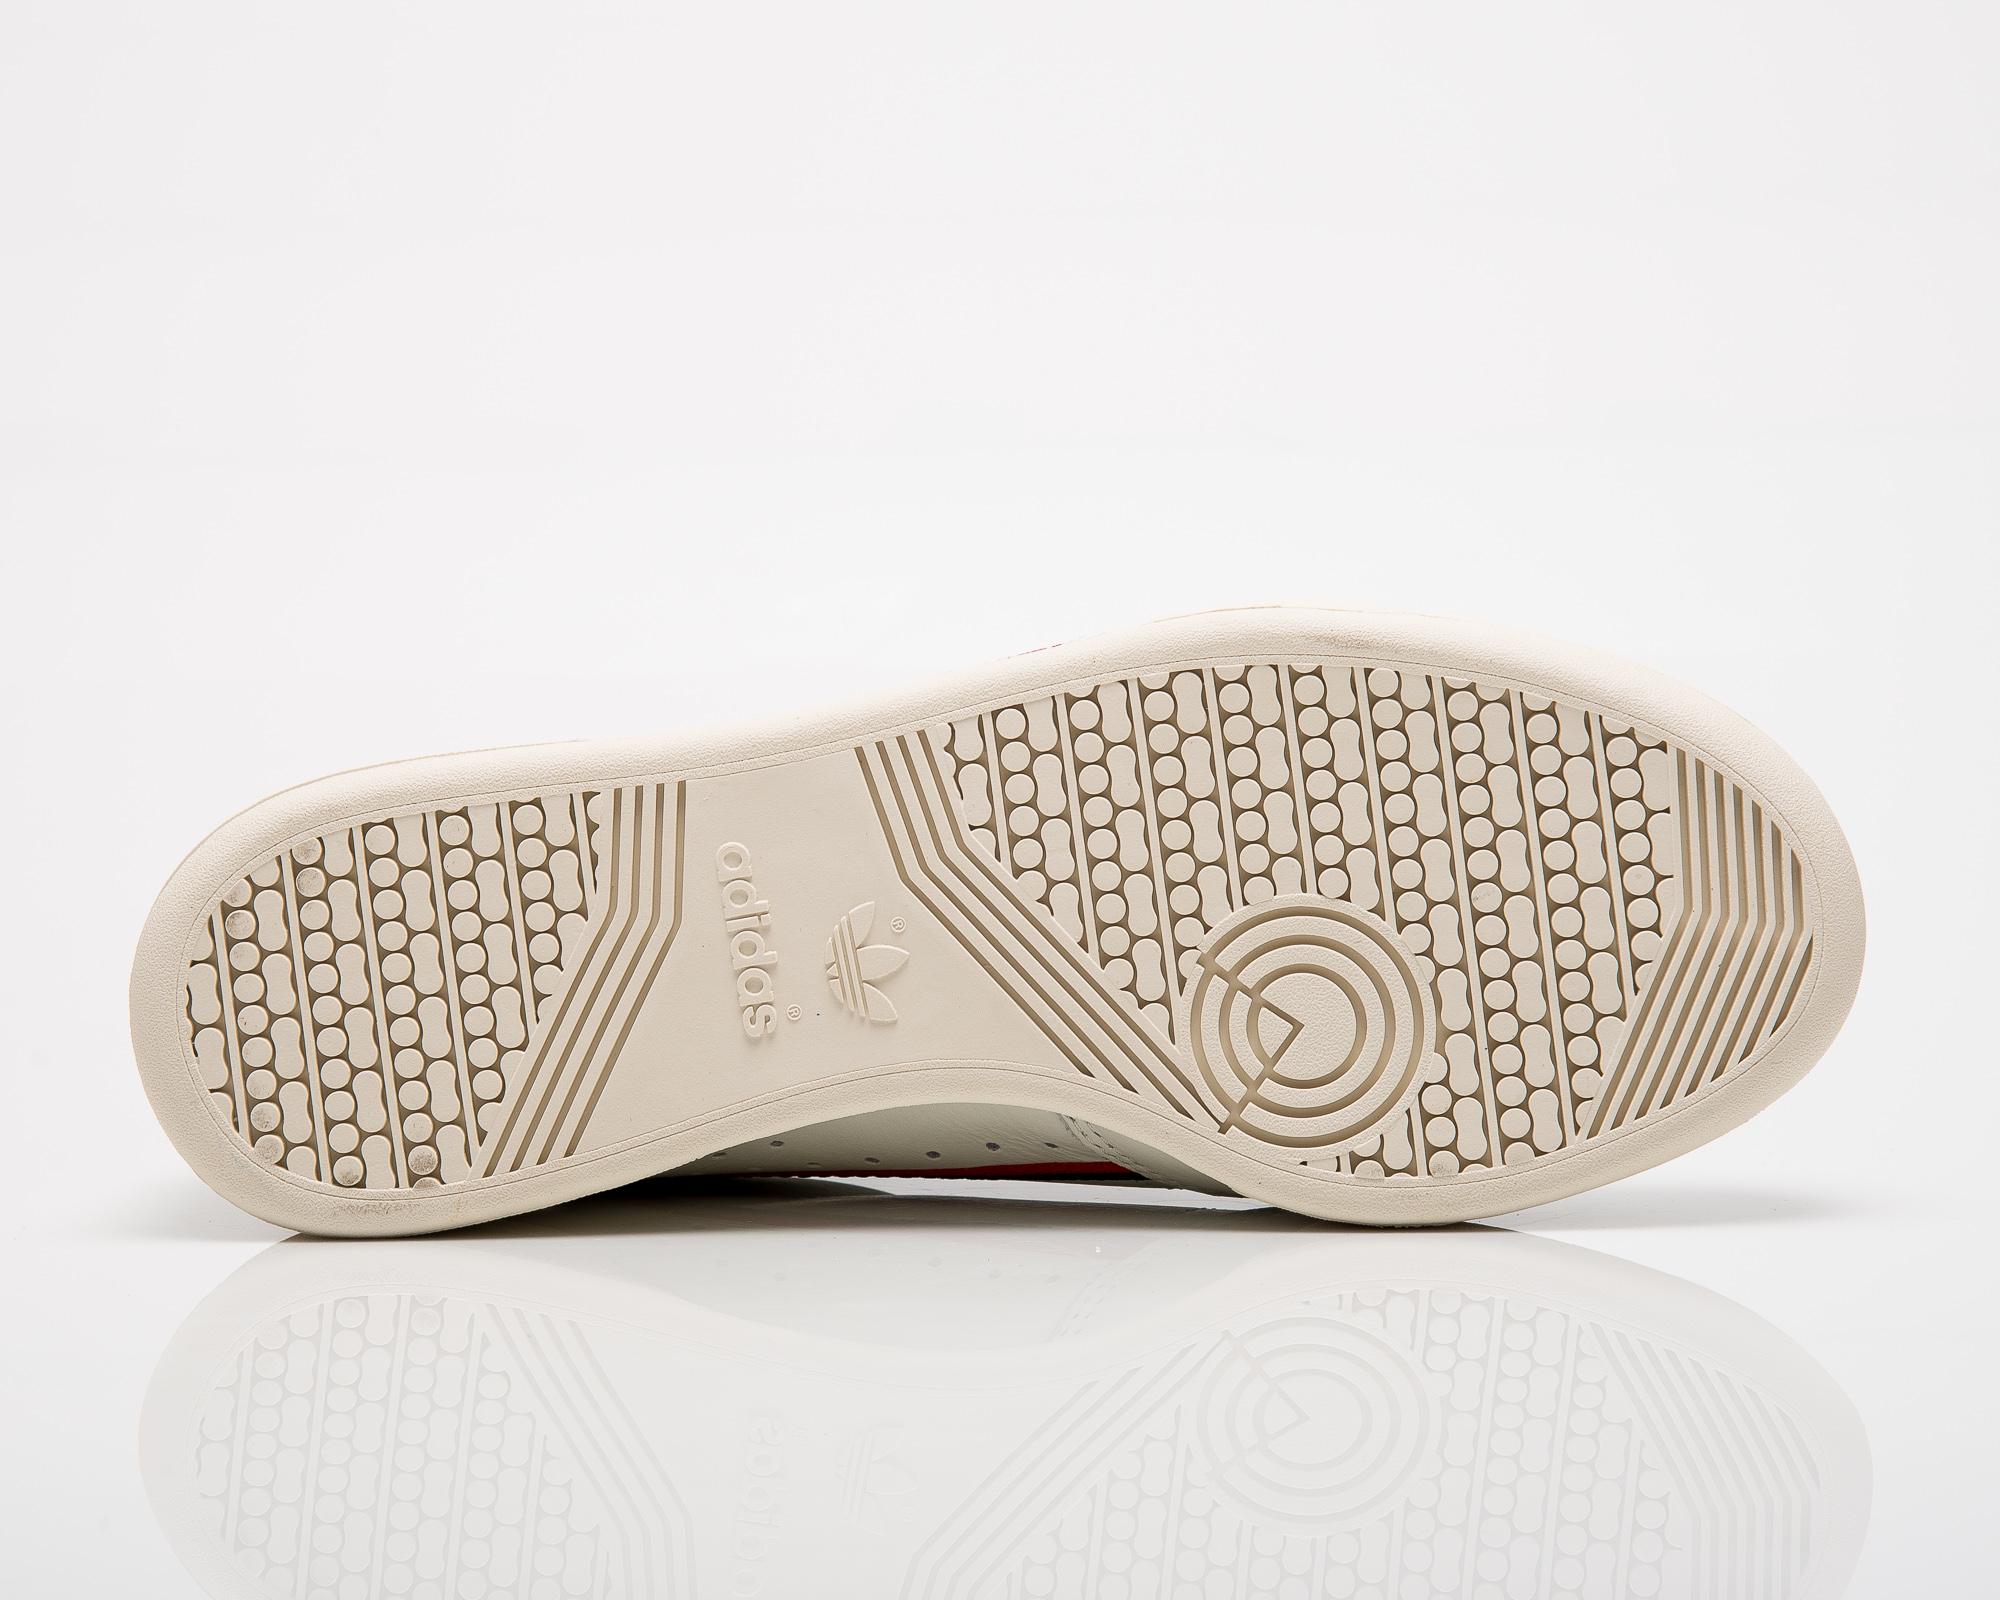 adidas originali continental 80 mascalzone scarpe casual sportive